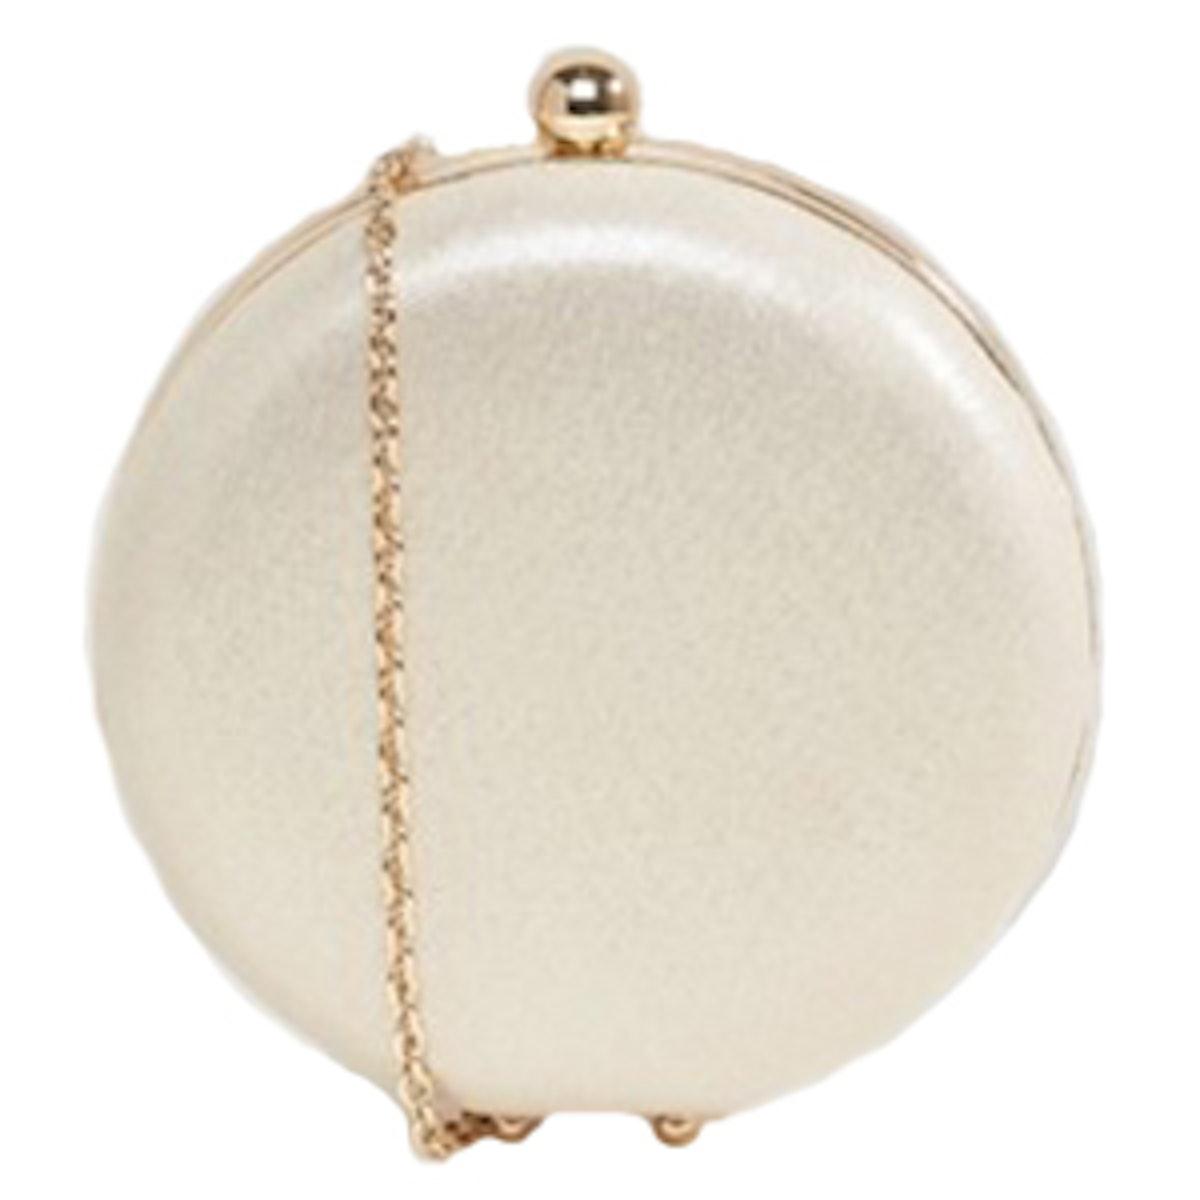 Metallic Round Box Clutch Bag